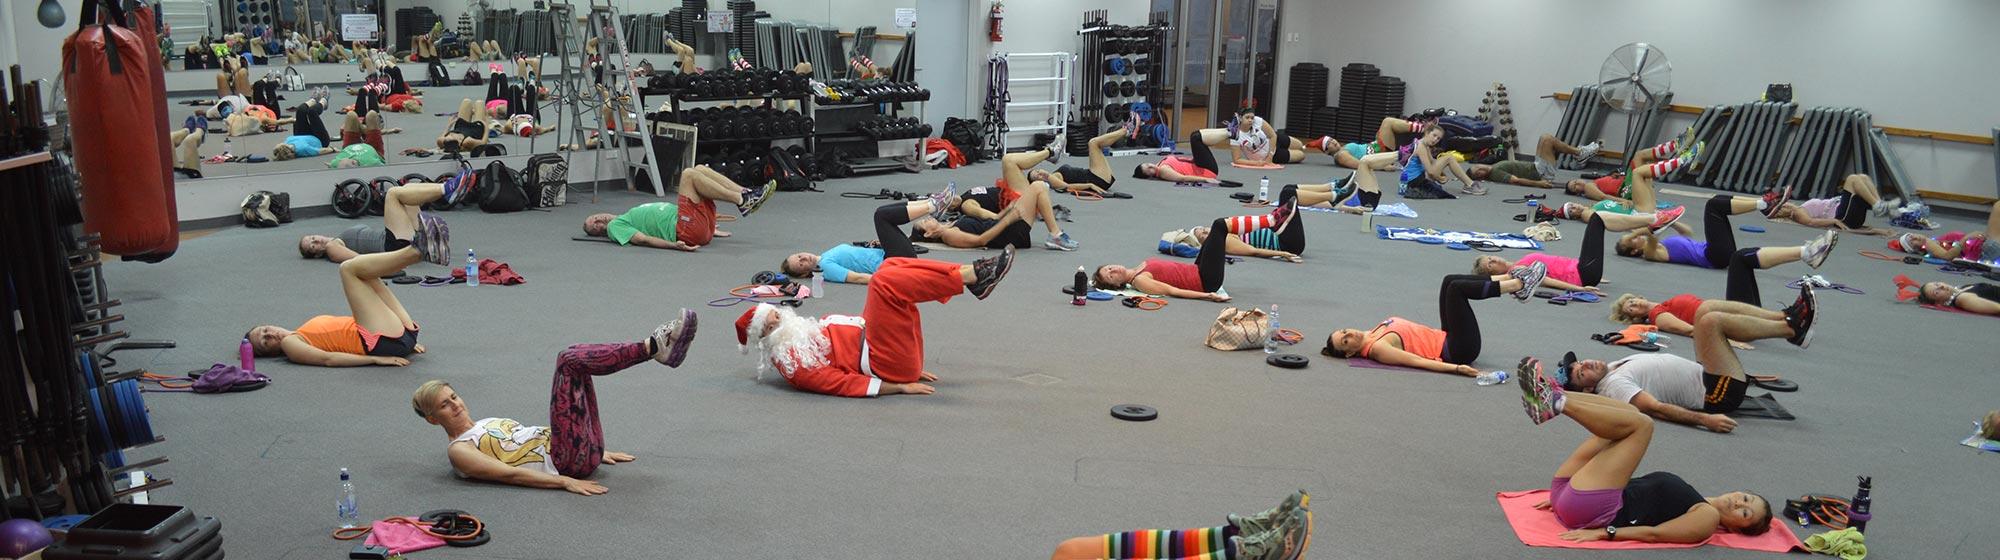 fitness classes darwin